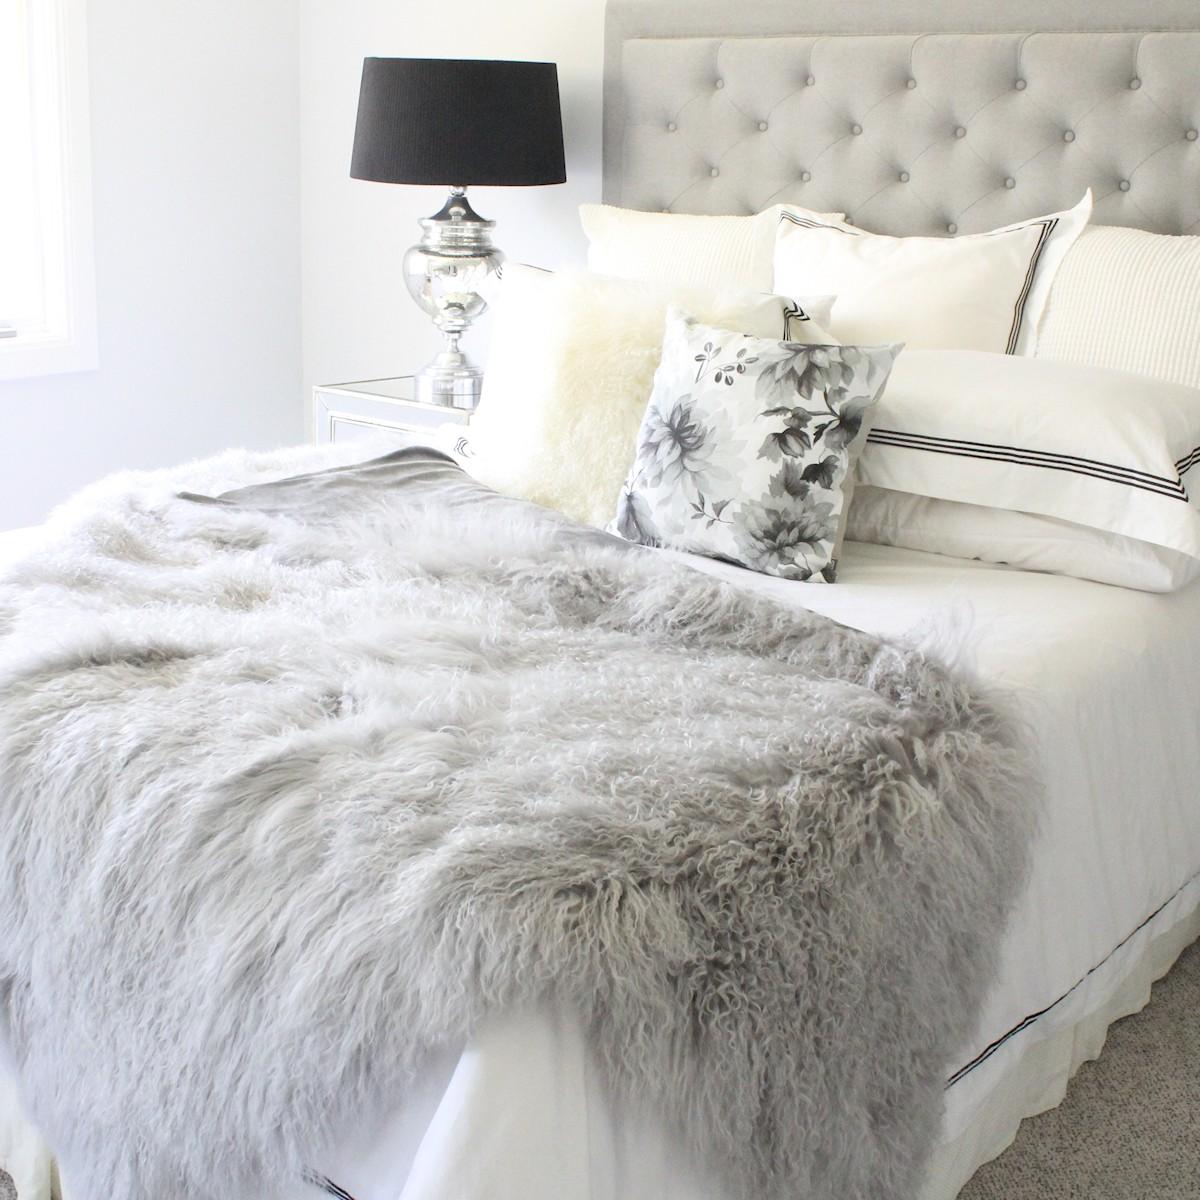 mongolian-tibetan-fur-sheepskin-grey-blanket-bed-throw-gray-eluxury-home_5.jpg